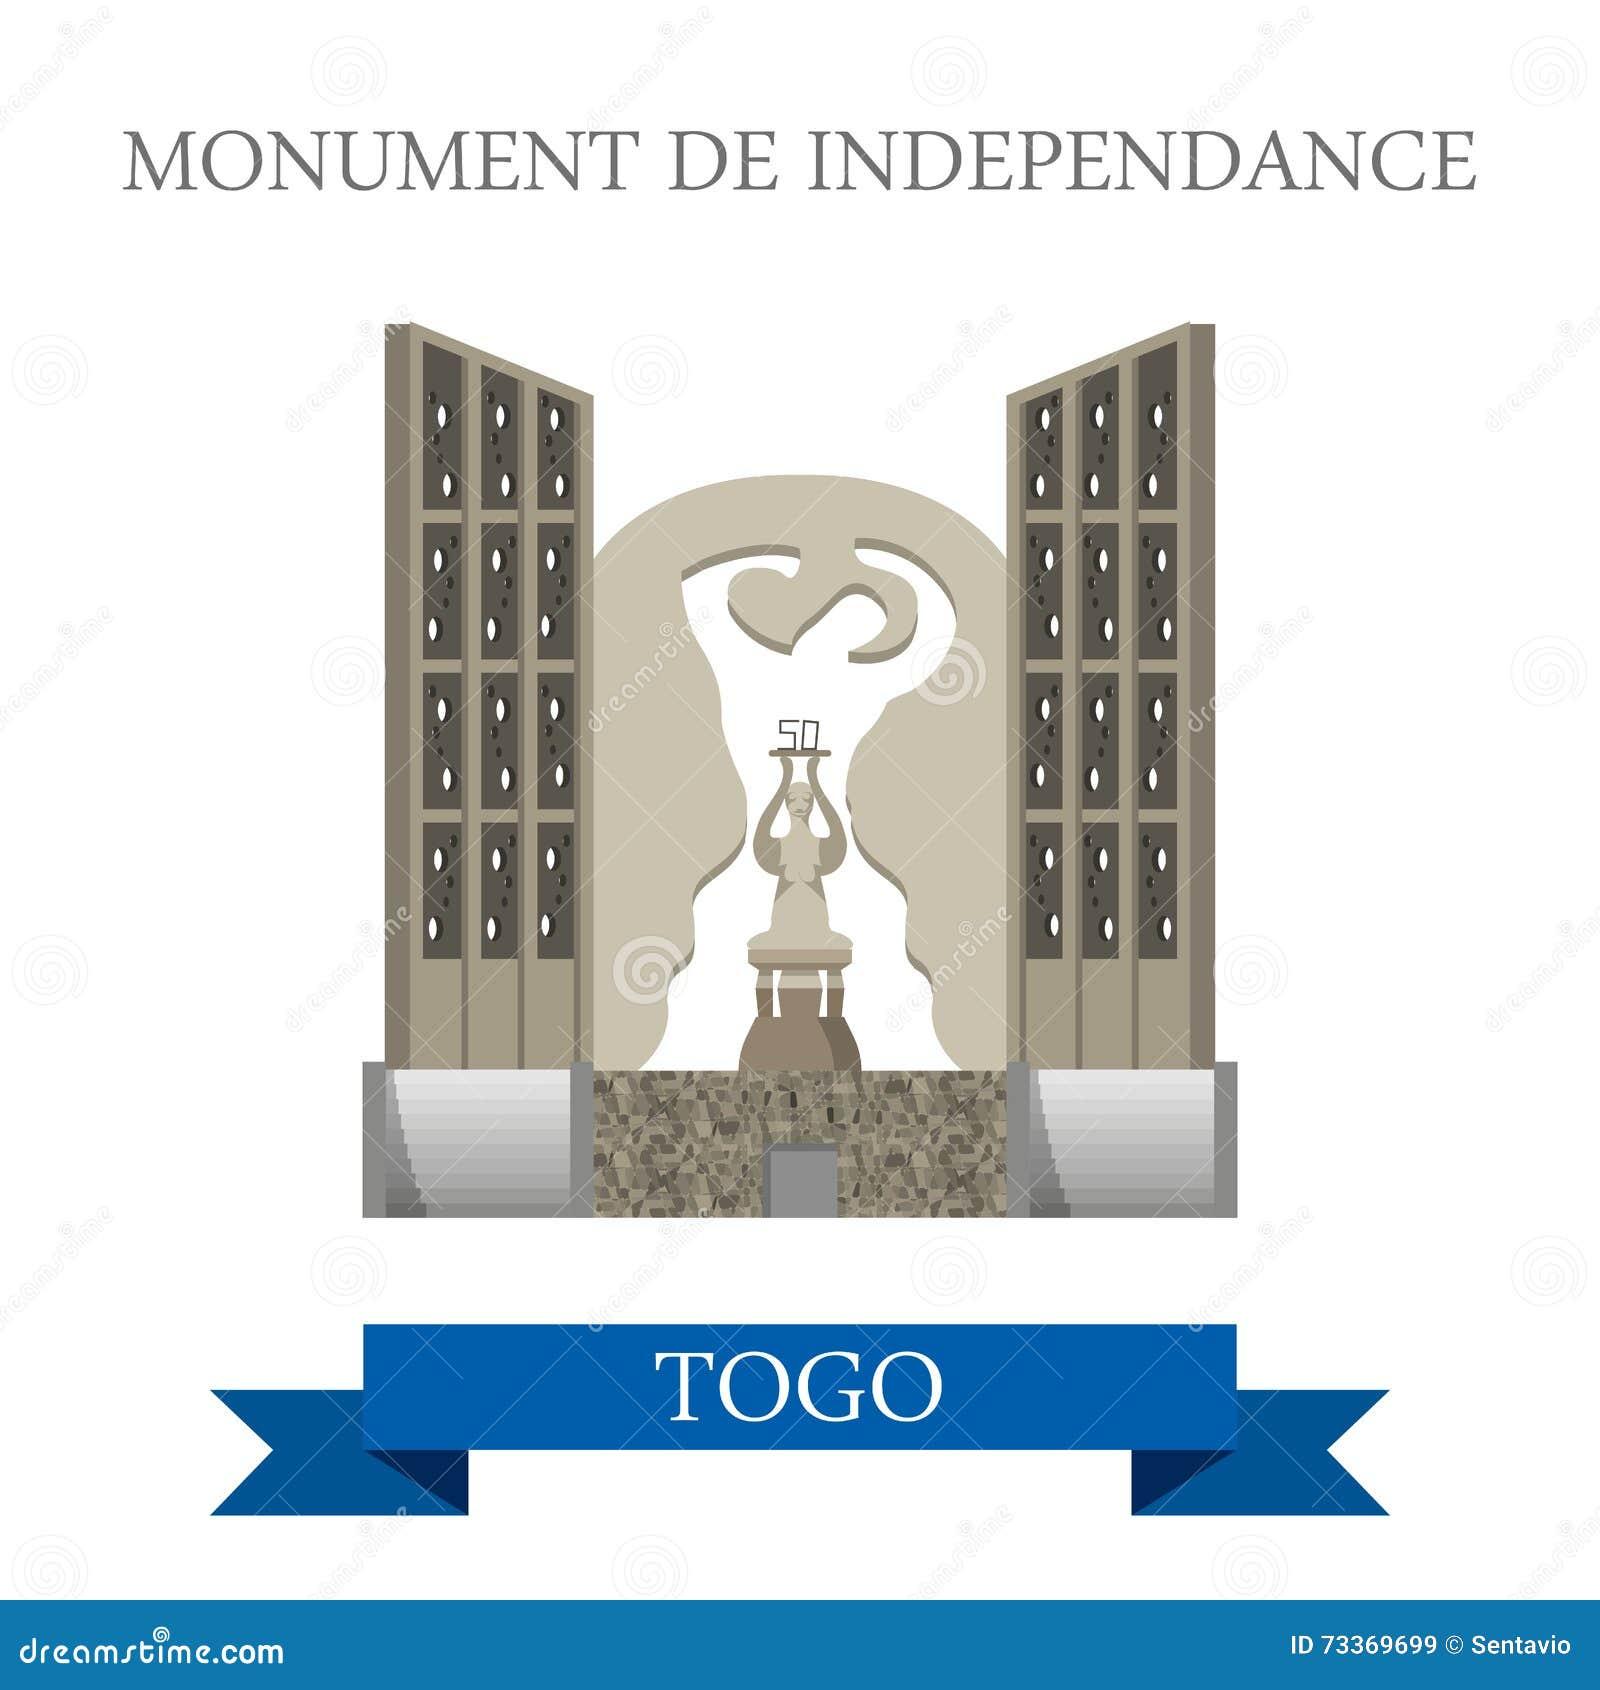 Sites de rencontres togo